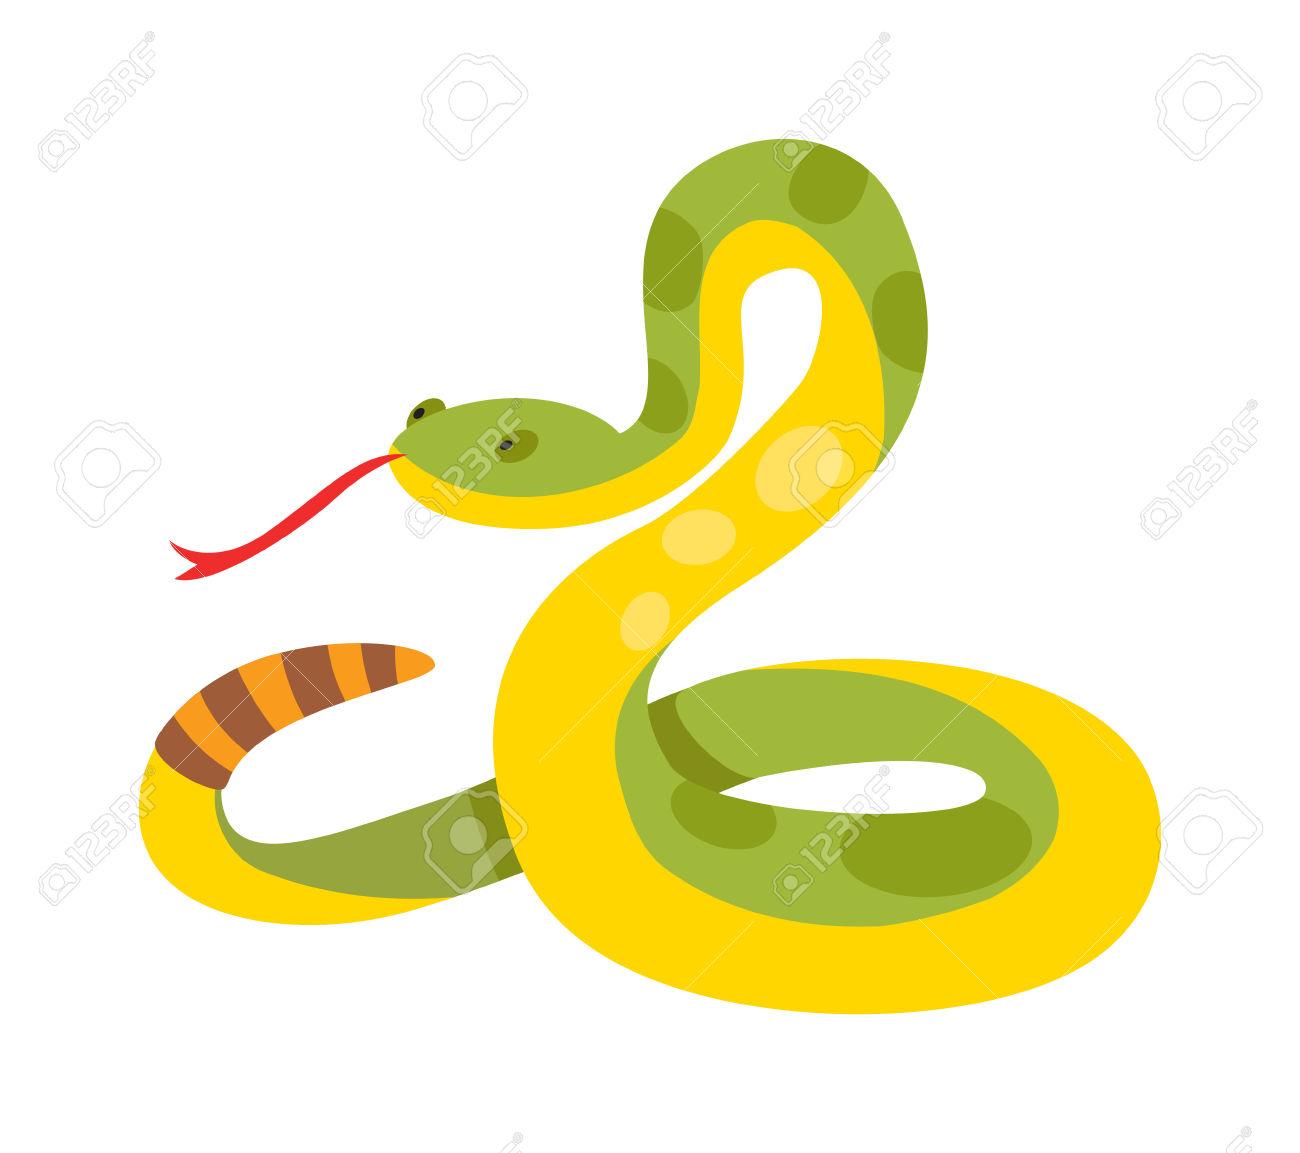 Gold Python Reticulated Albino Boa Constrictor Wildlife Nature.